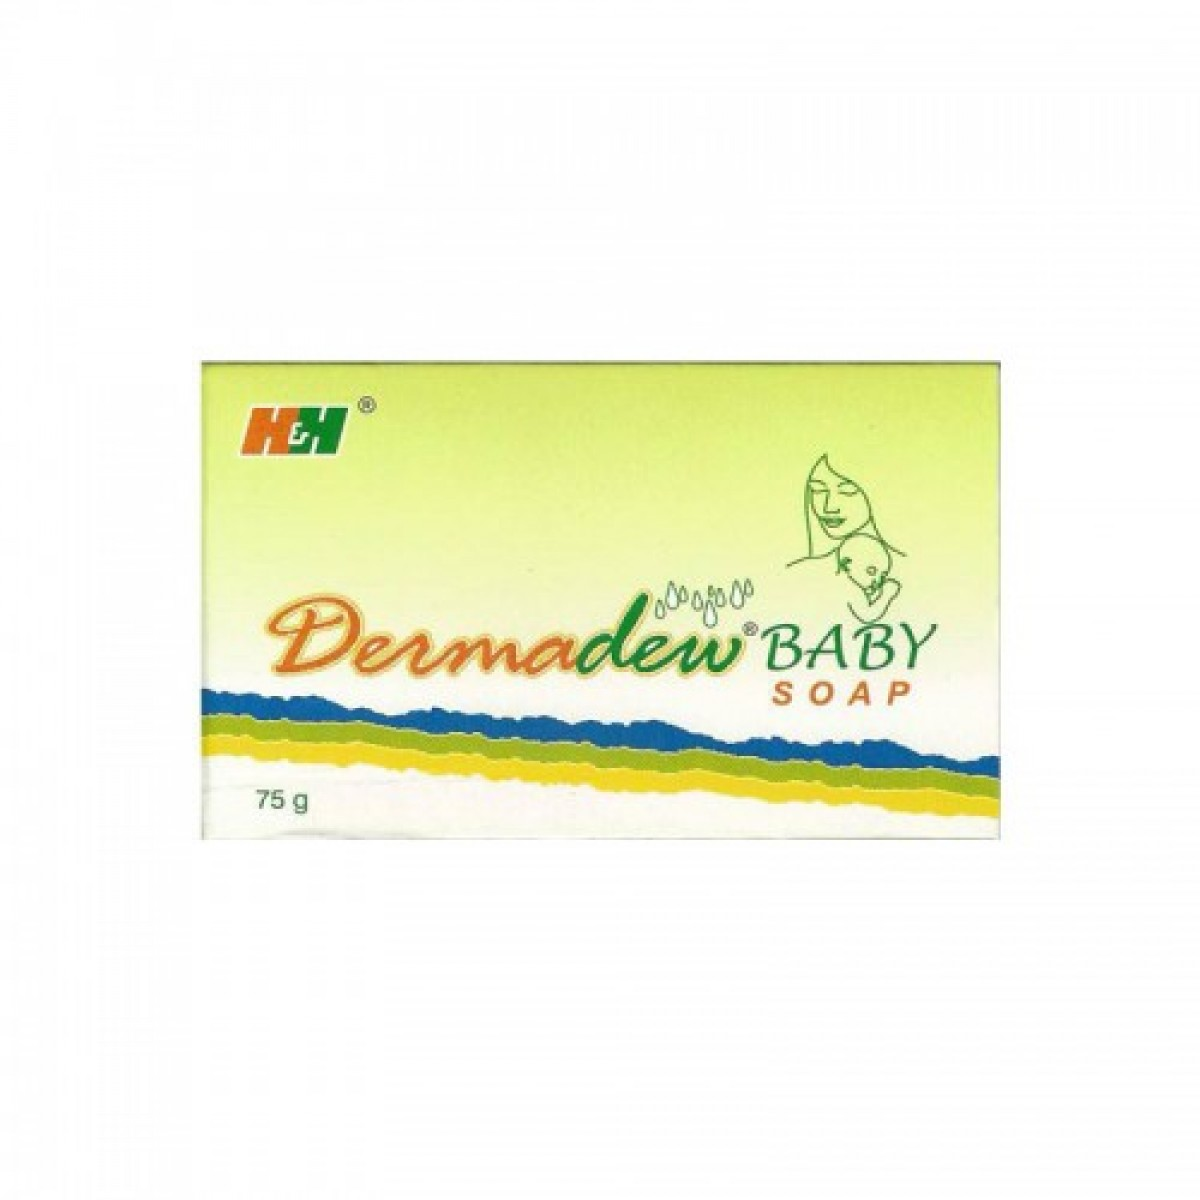 Dermadew Baby Soap Image